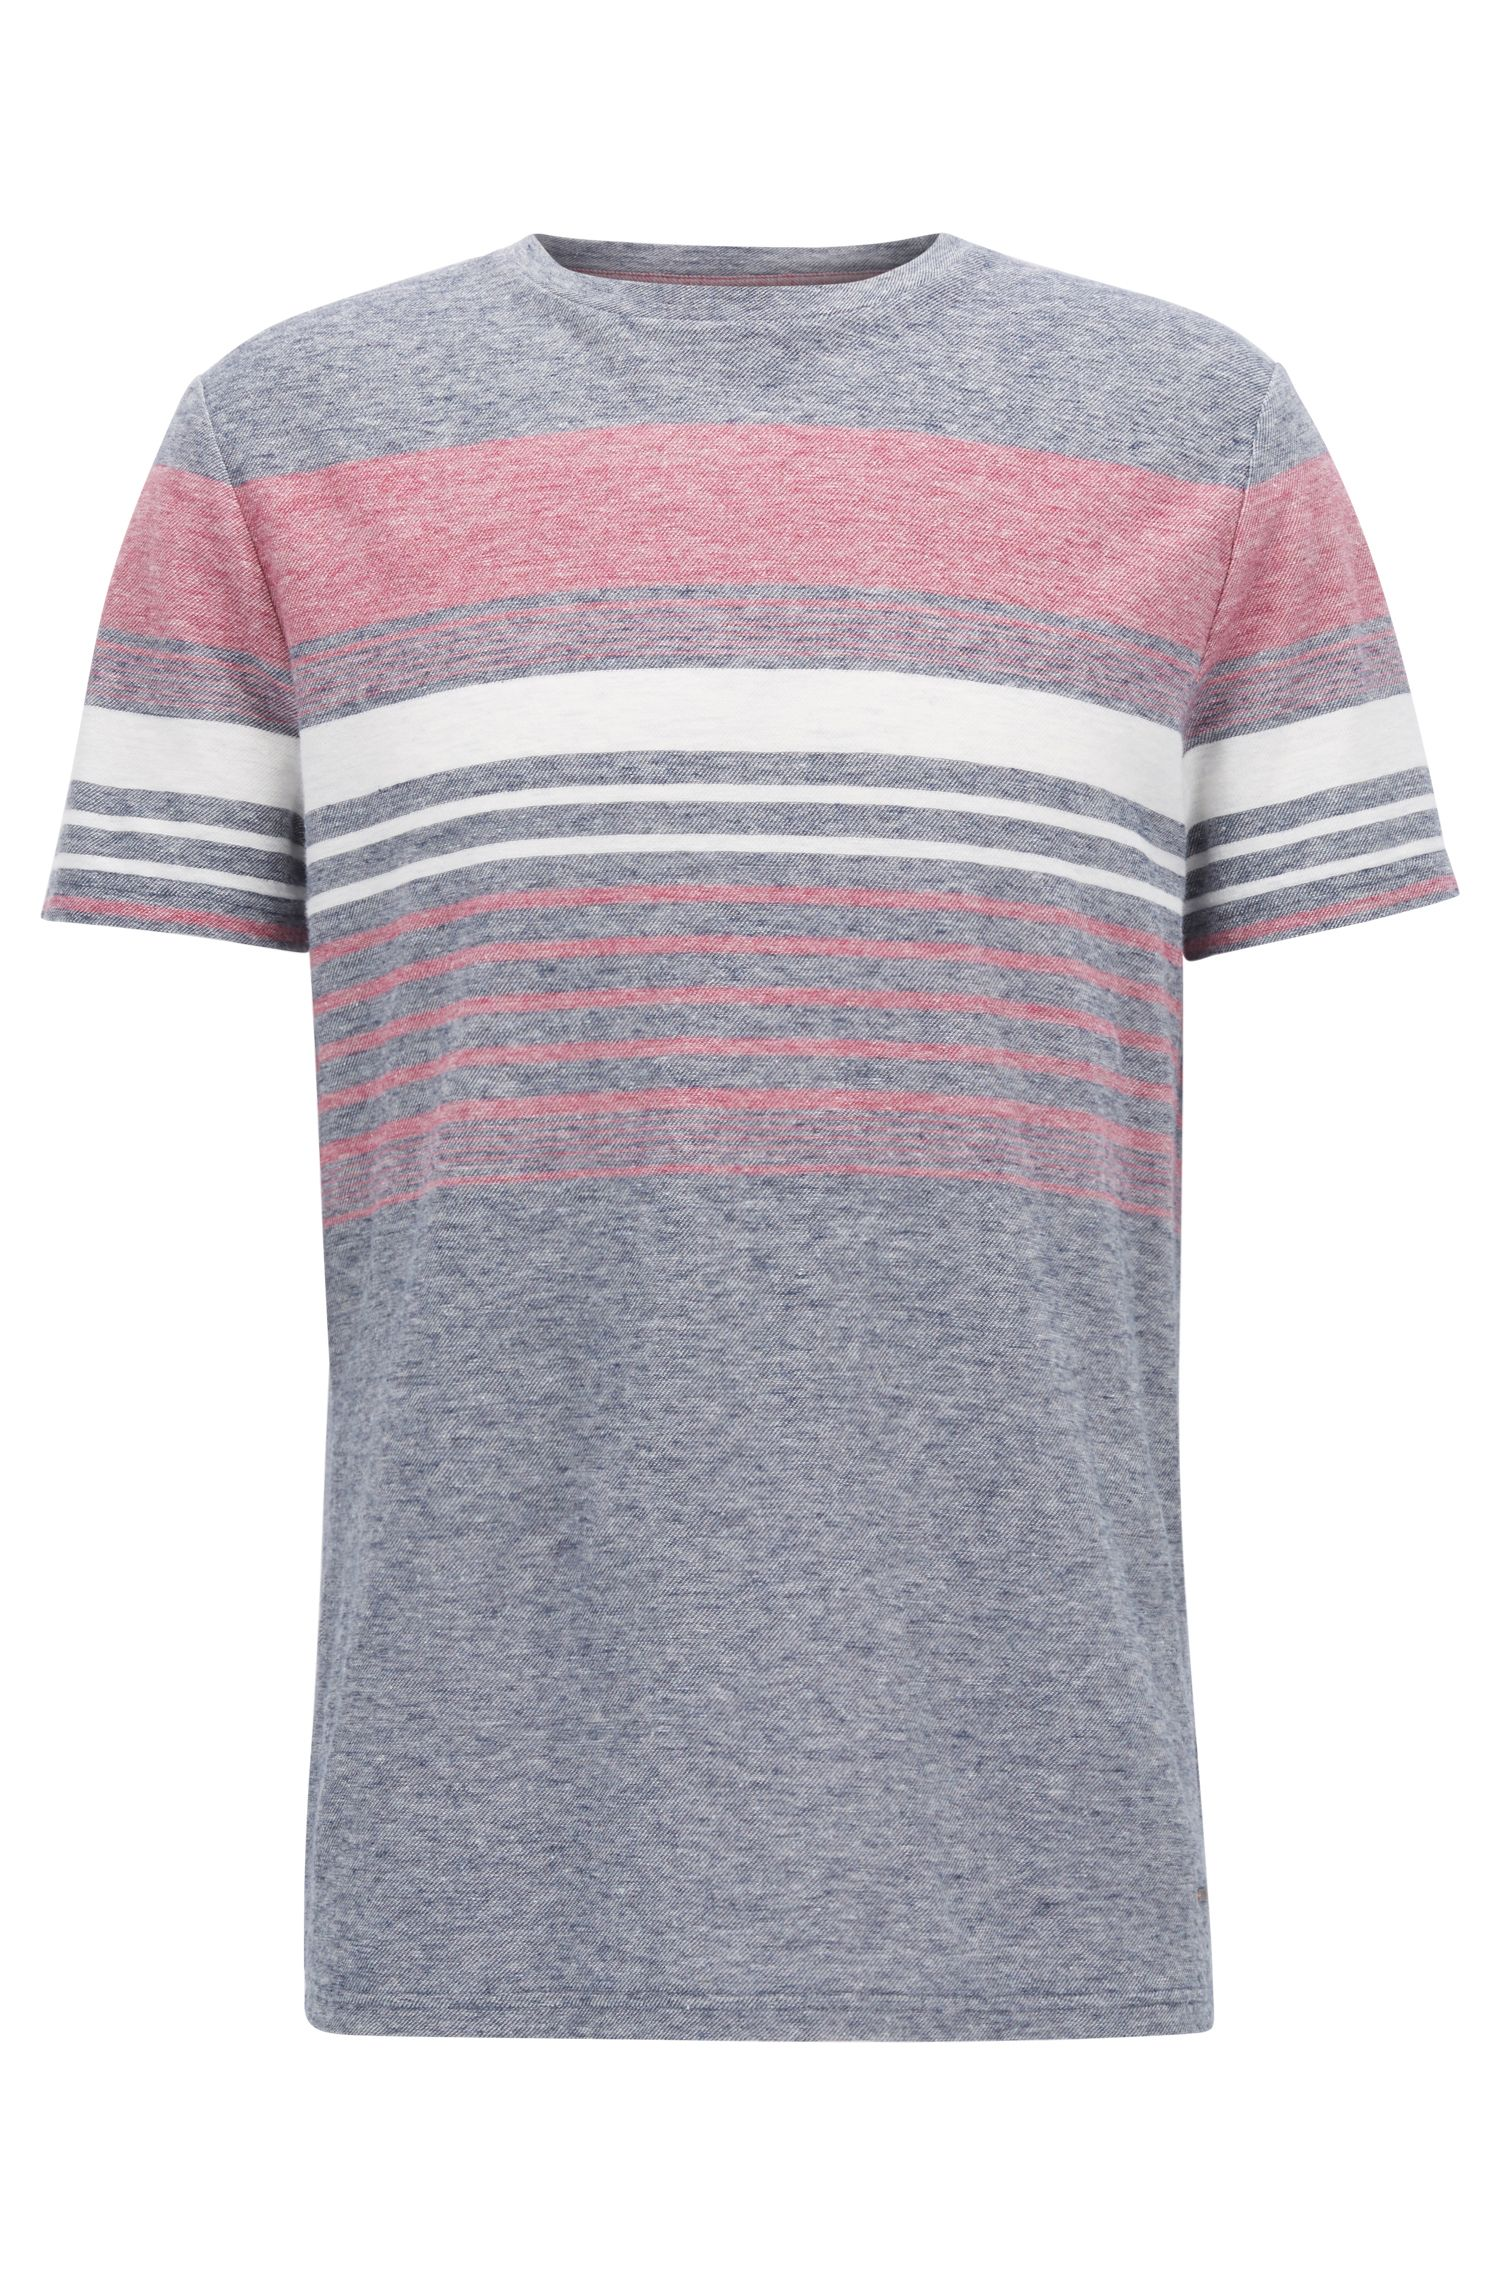 Cotton Linen T-Shirt | Tilak